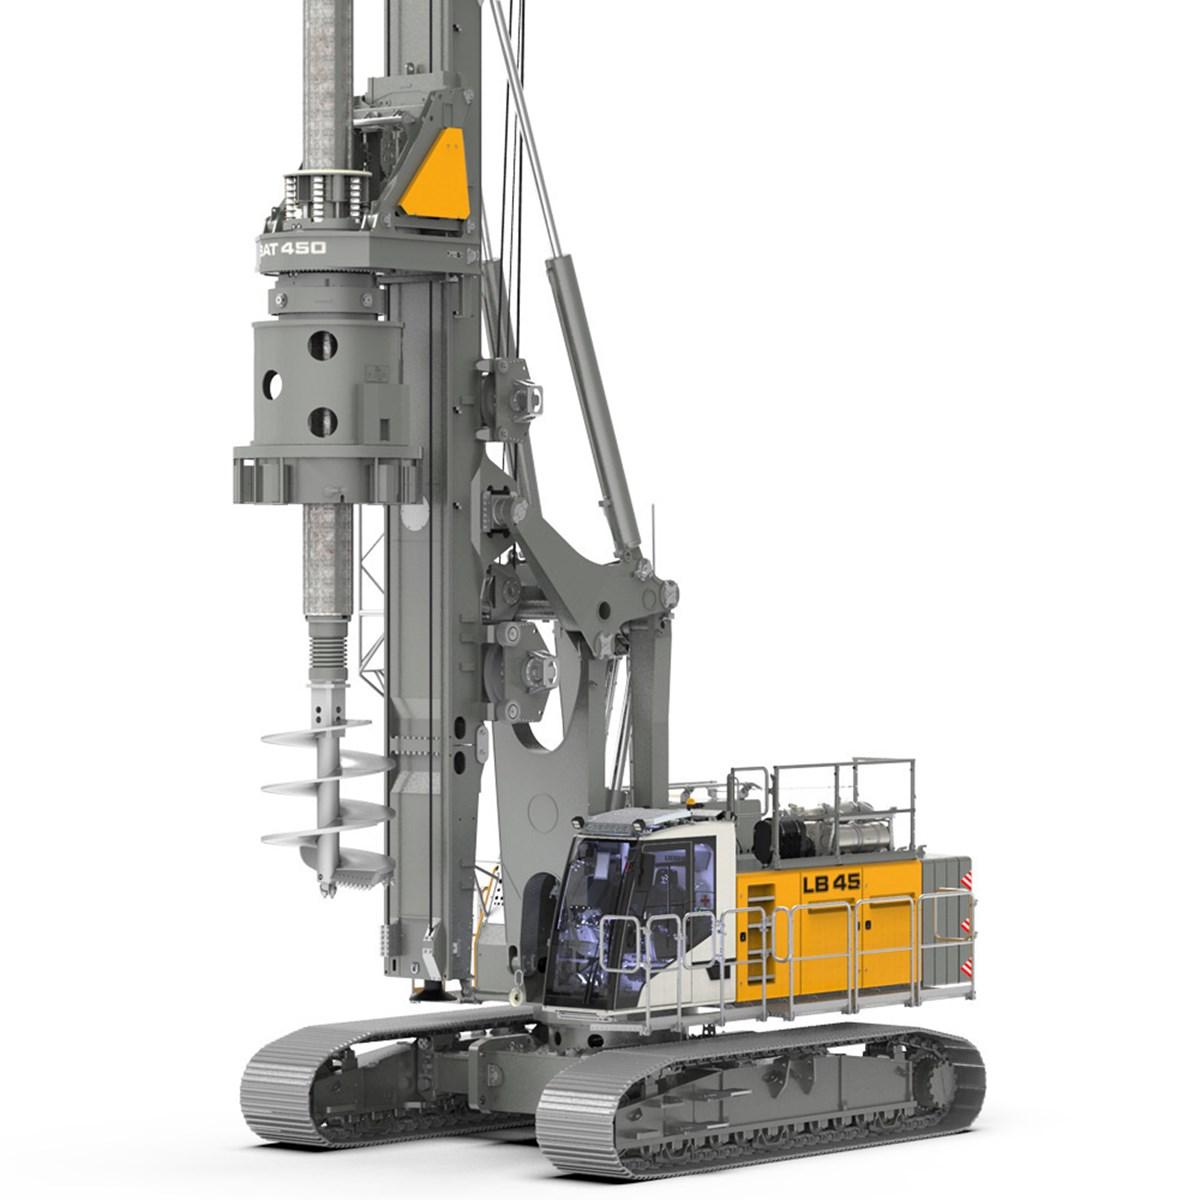 liebherr-lb-45-drilling-rig-pic2-1.jpg